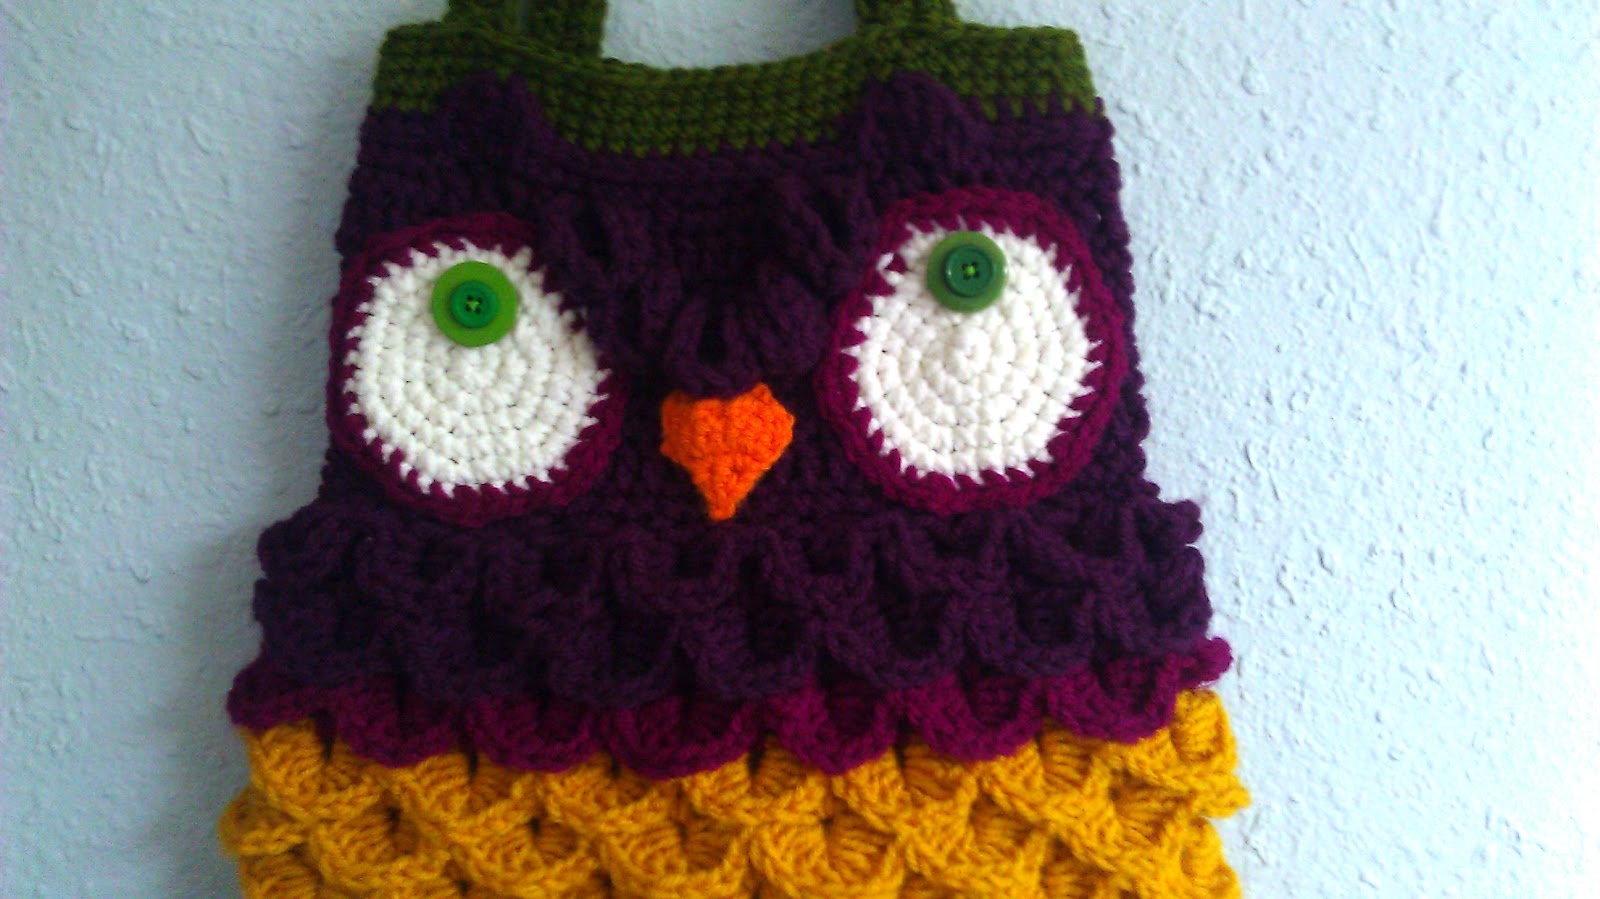 Crochet Owl Bag Pattern A Craft A Day Keeps Boredom Away